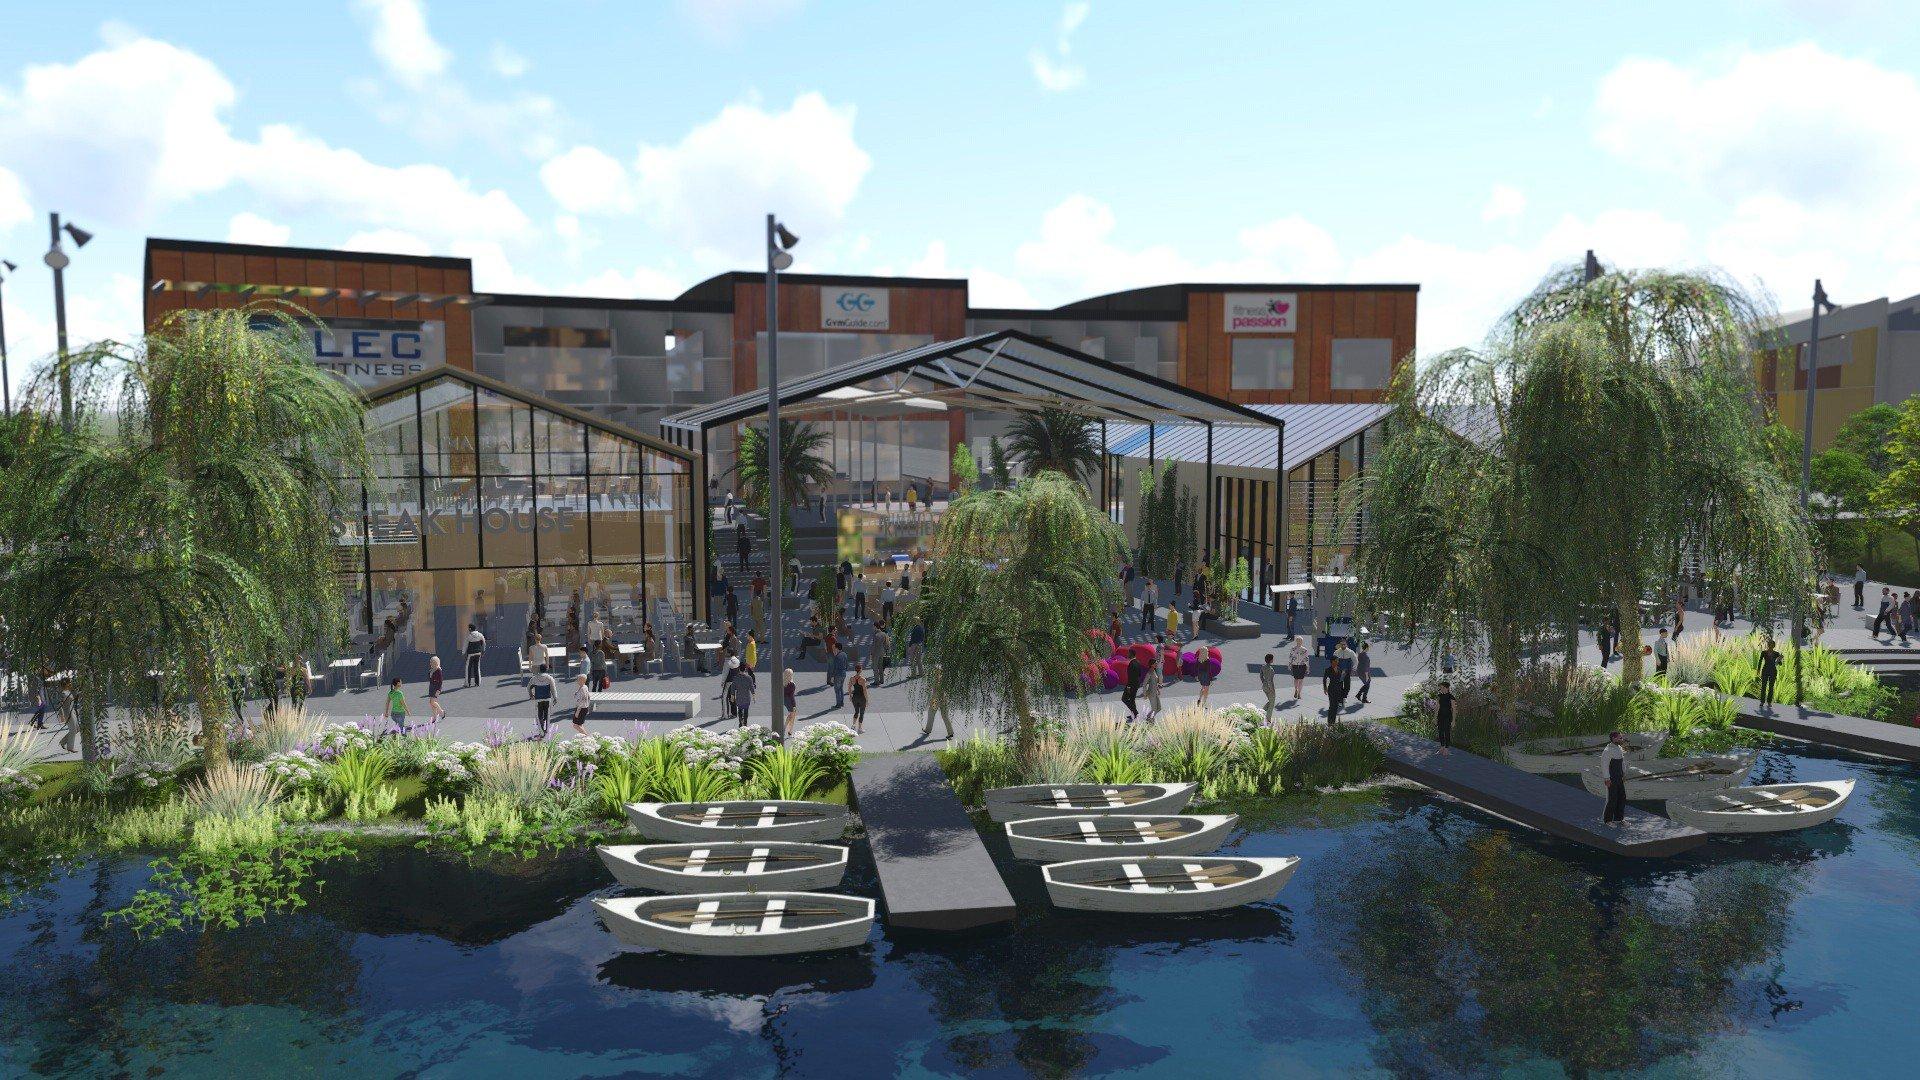 Реализация инвестпроекта компании IKEA за14 млрд руб началась вАдыгее